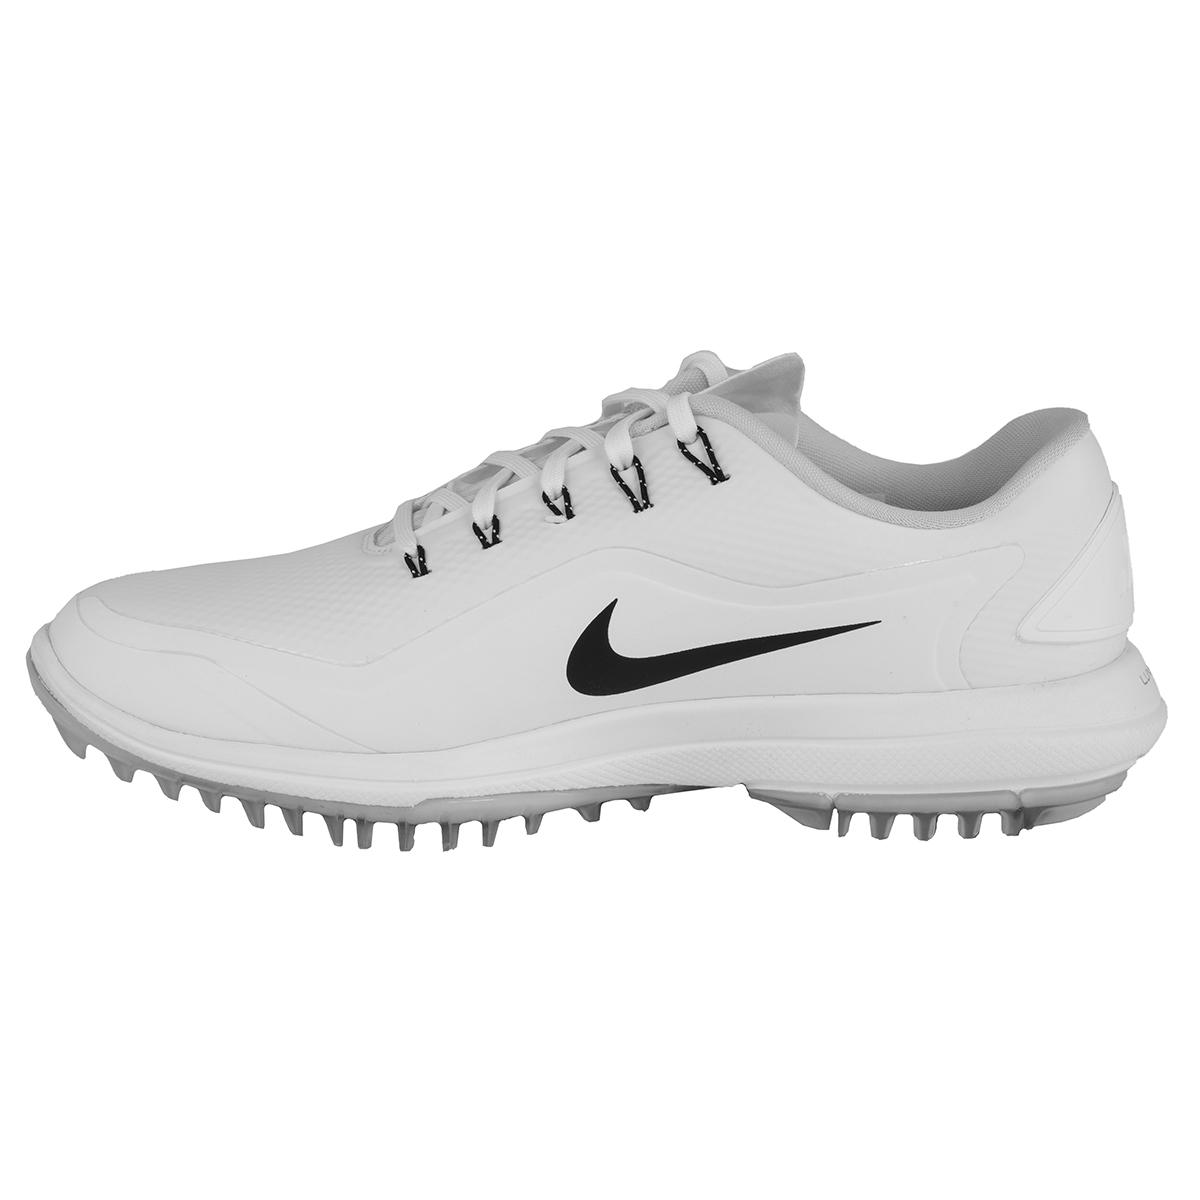 973c5429127f Nike Men s Lunar Control Vapor 2 Golf Shoes White Black 10.5 W